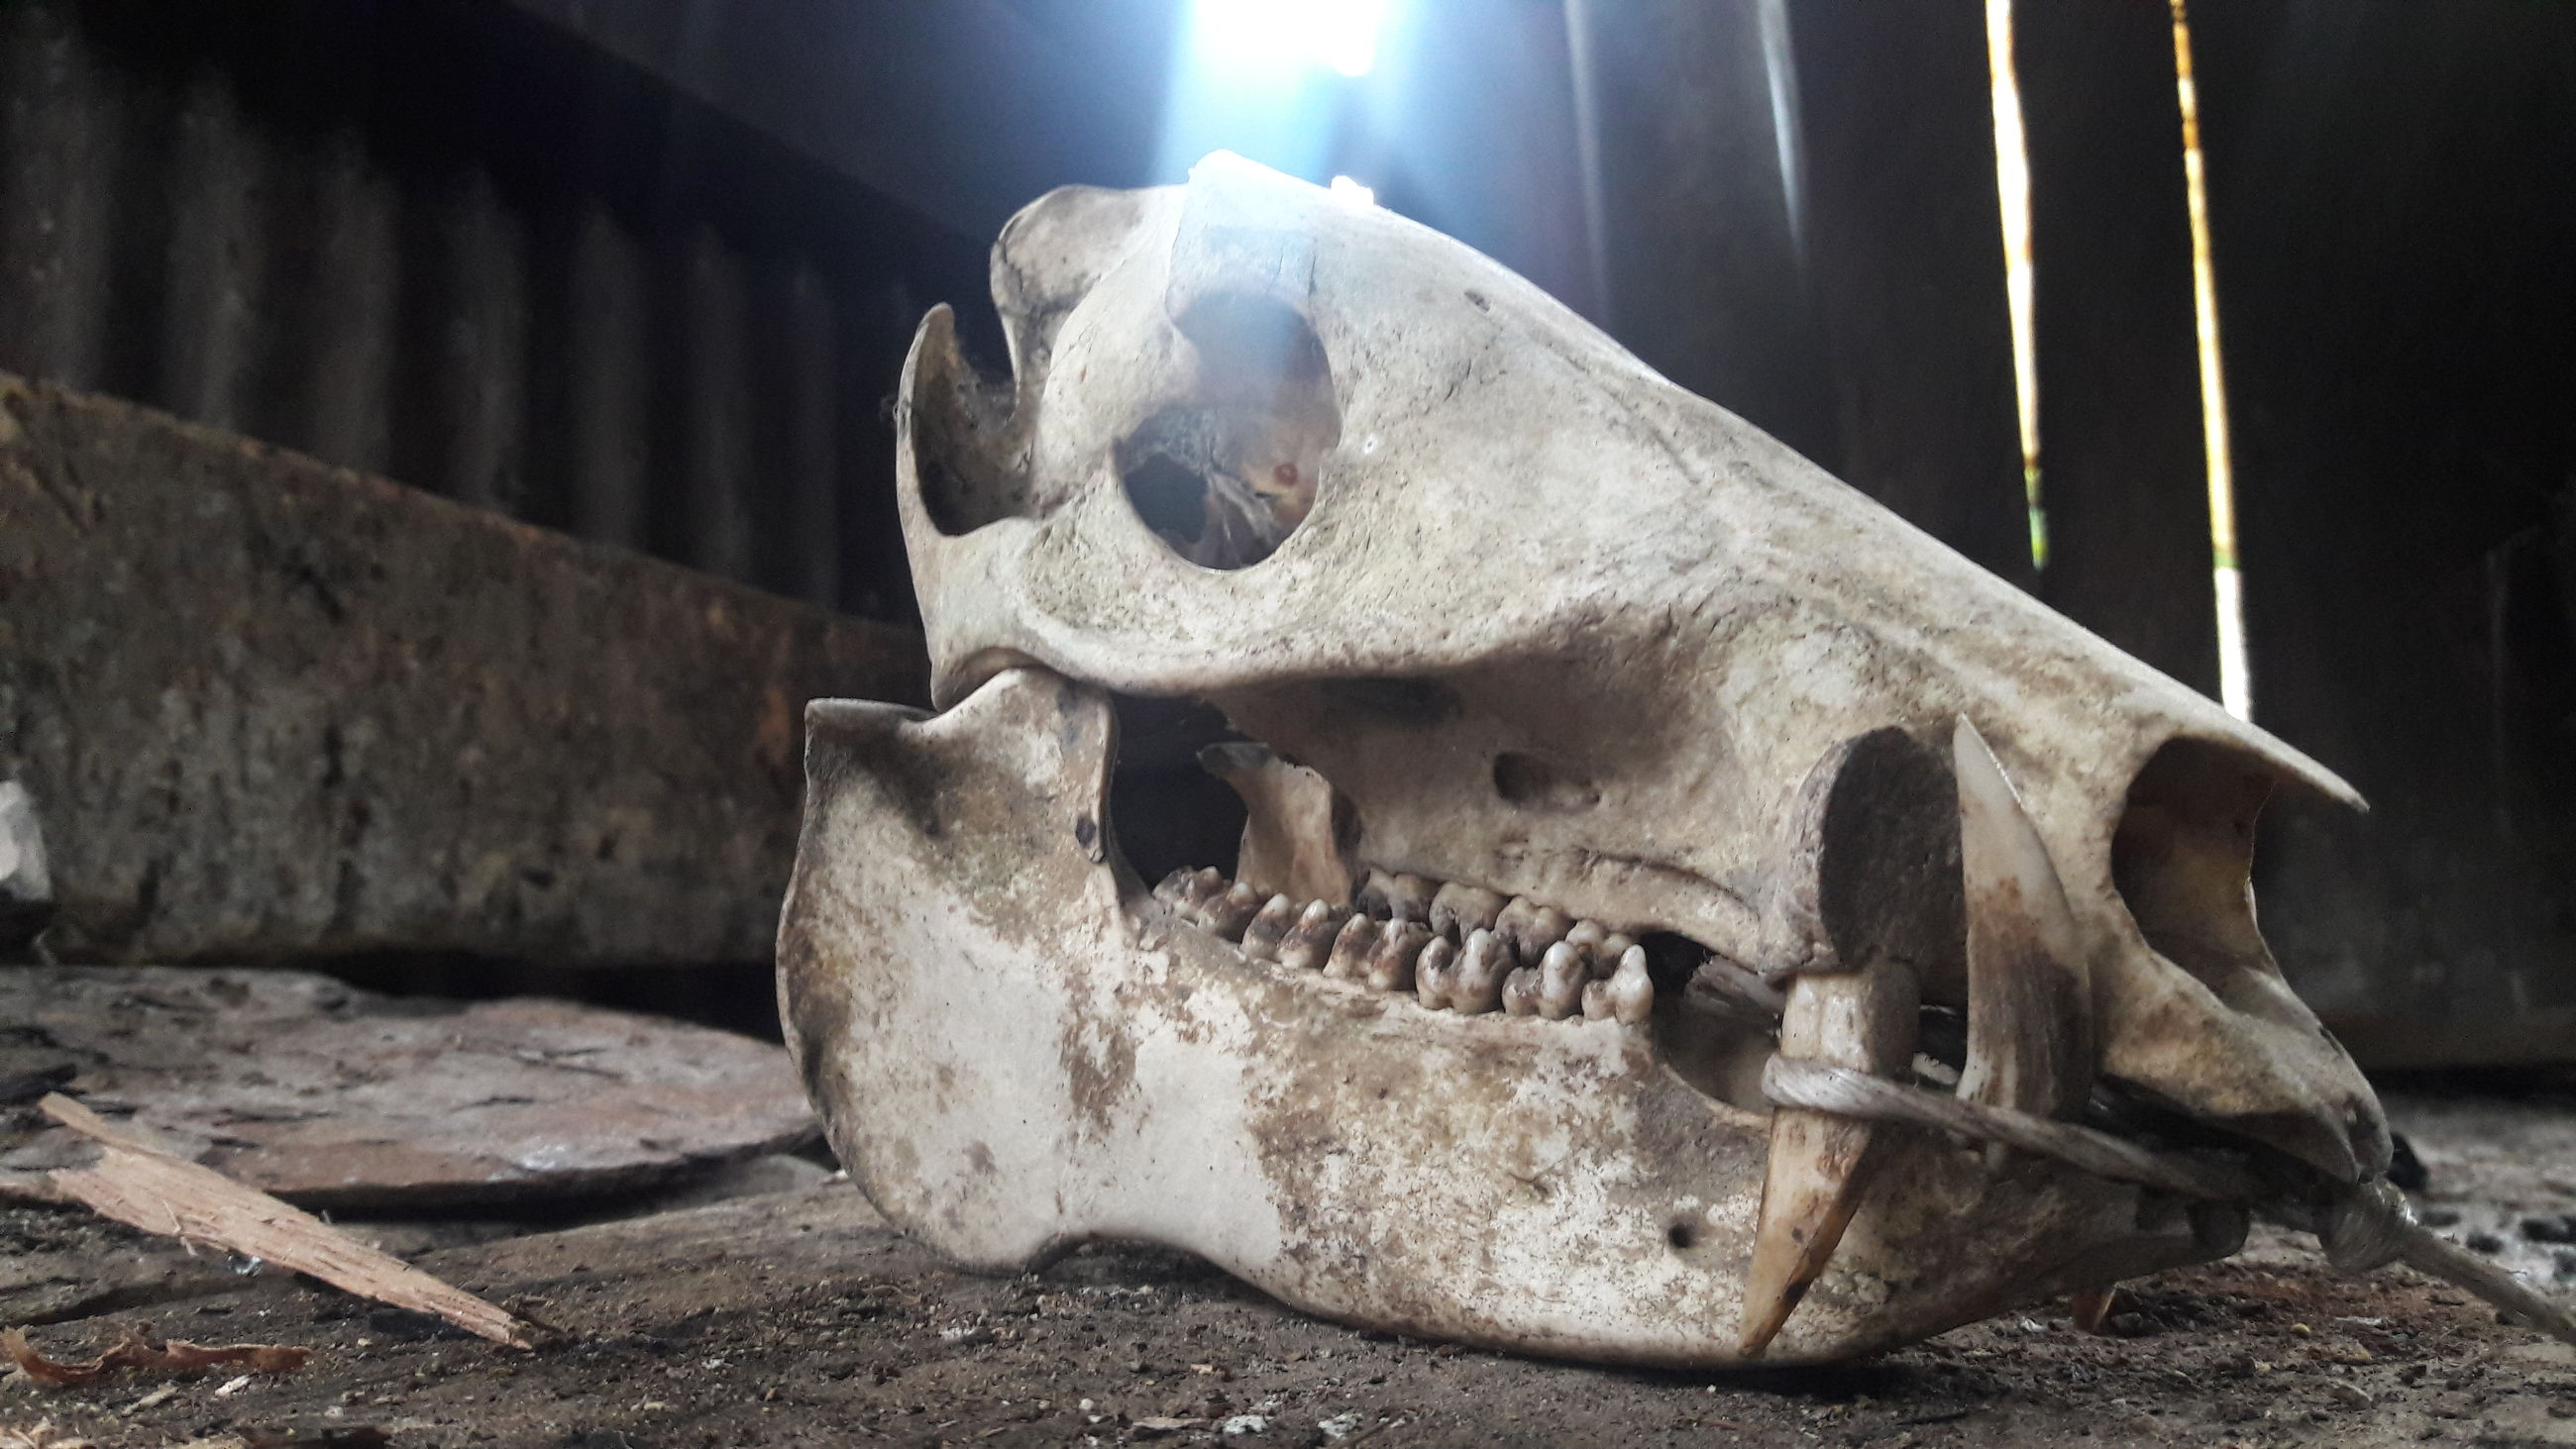 no people, close-up, animal skull, extinct, indoors, day